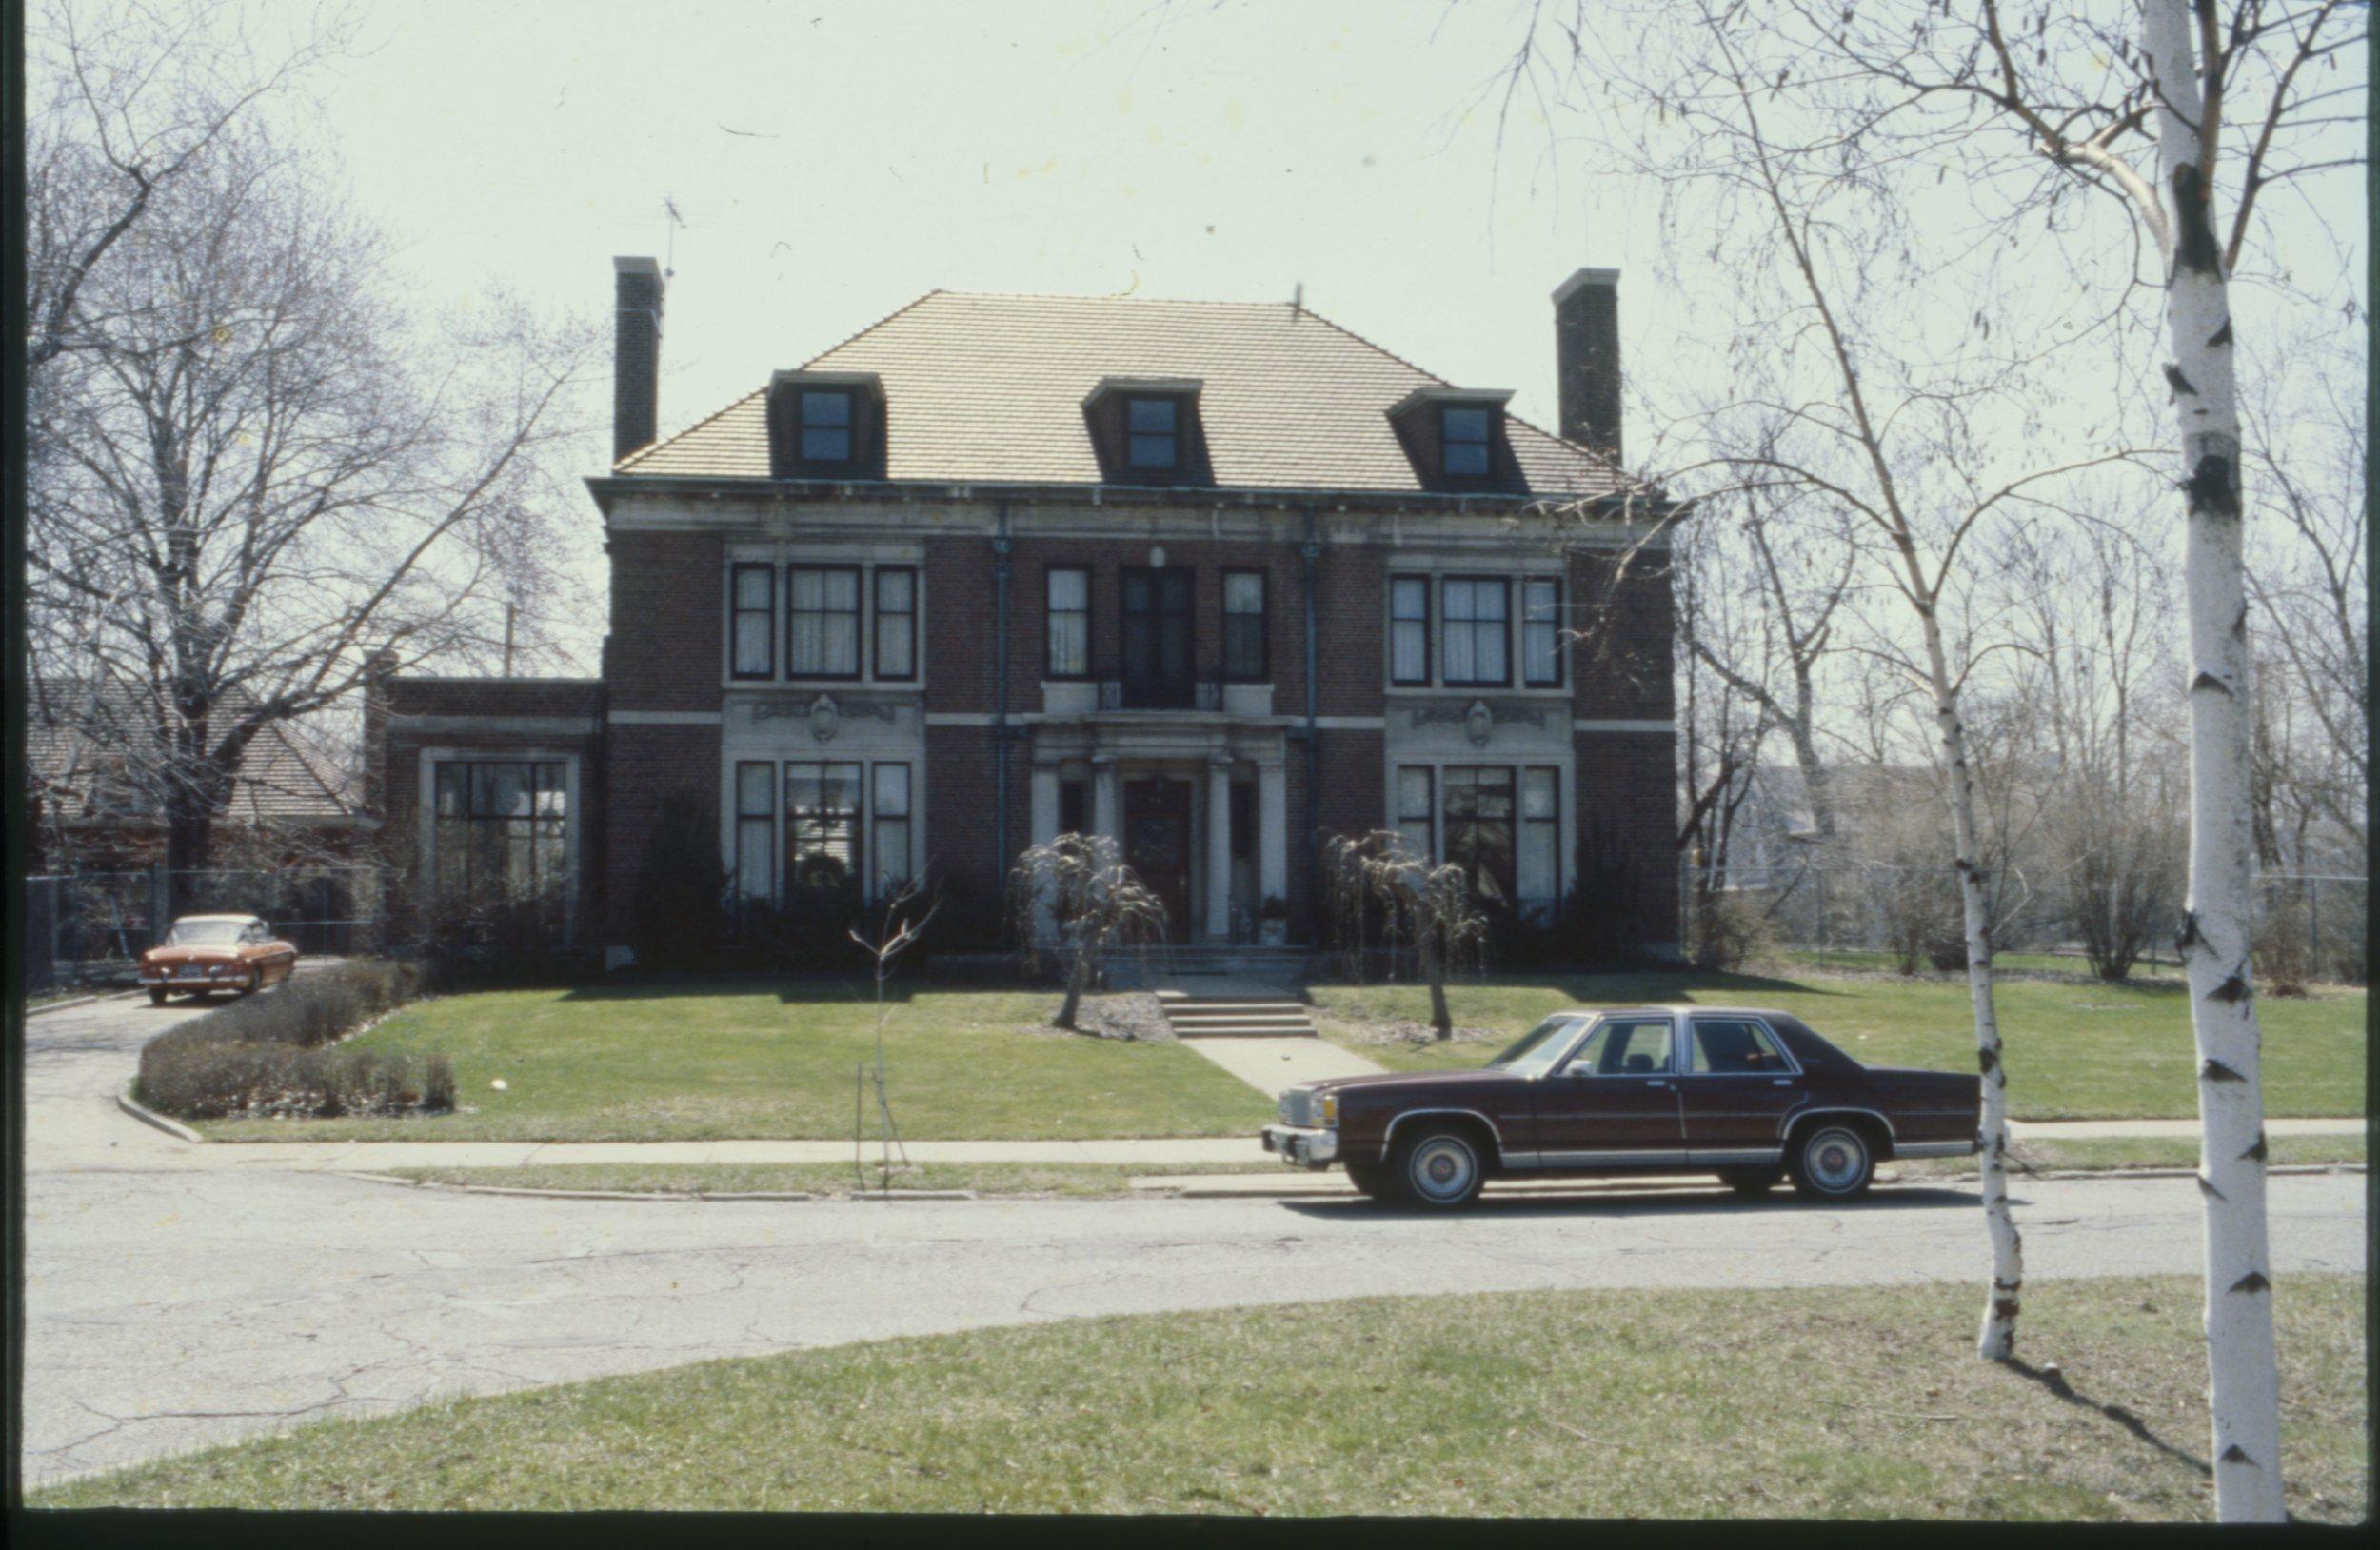 51 W. Boston 1980_1.jpg